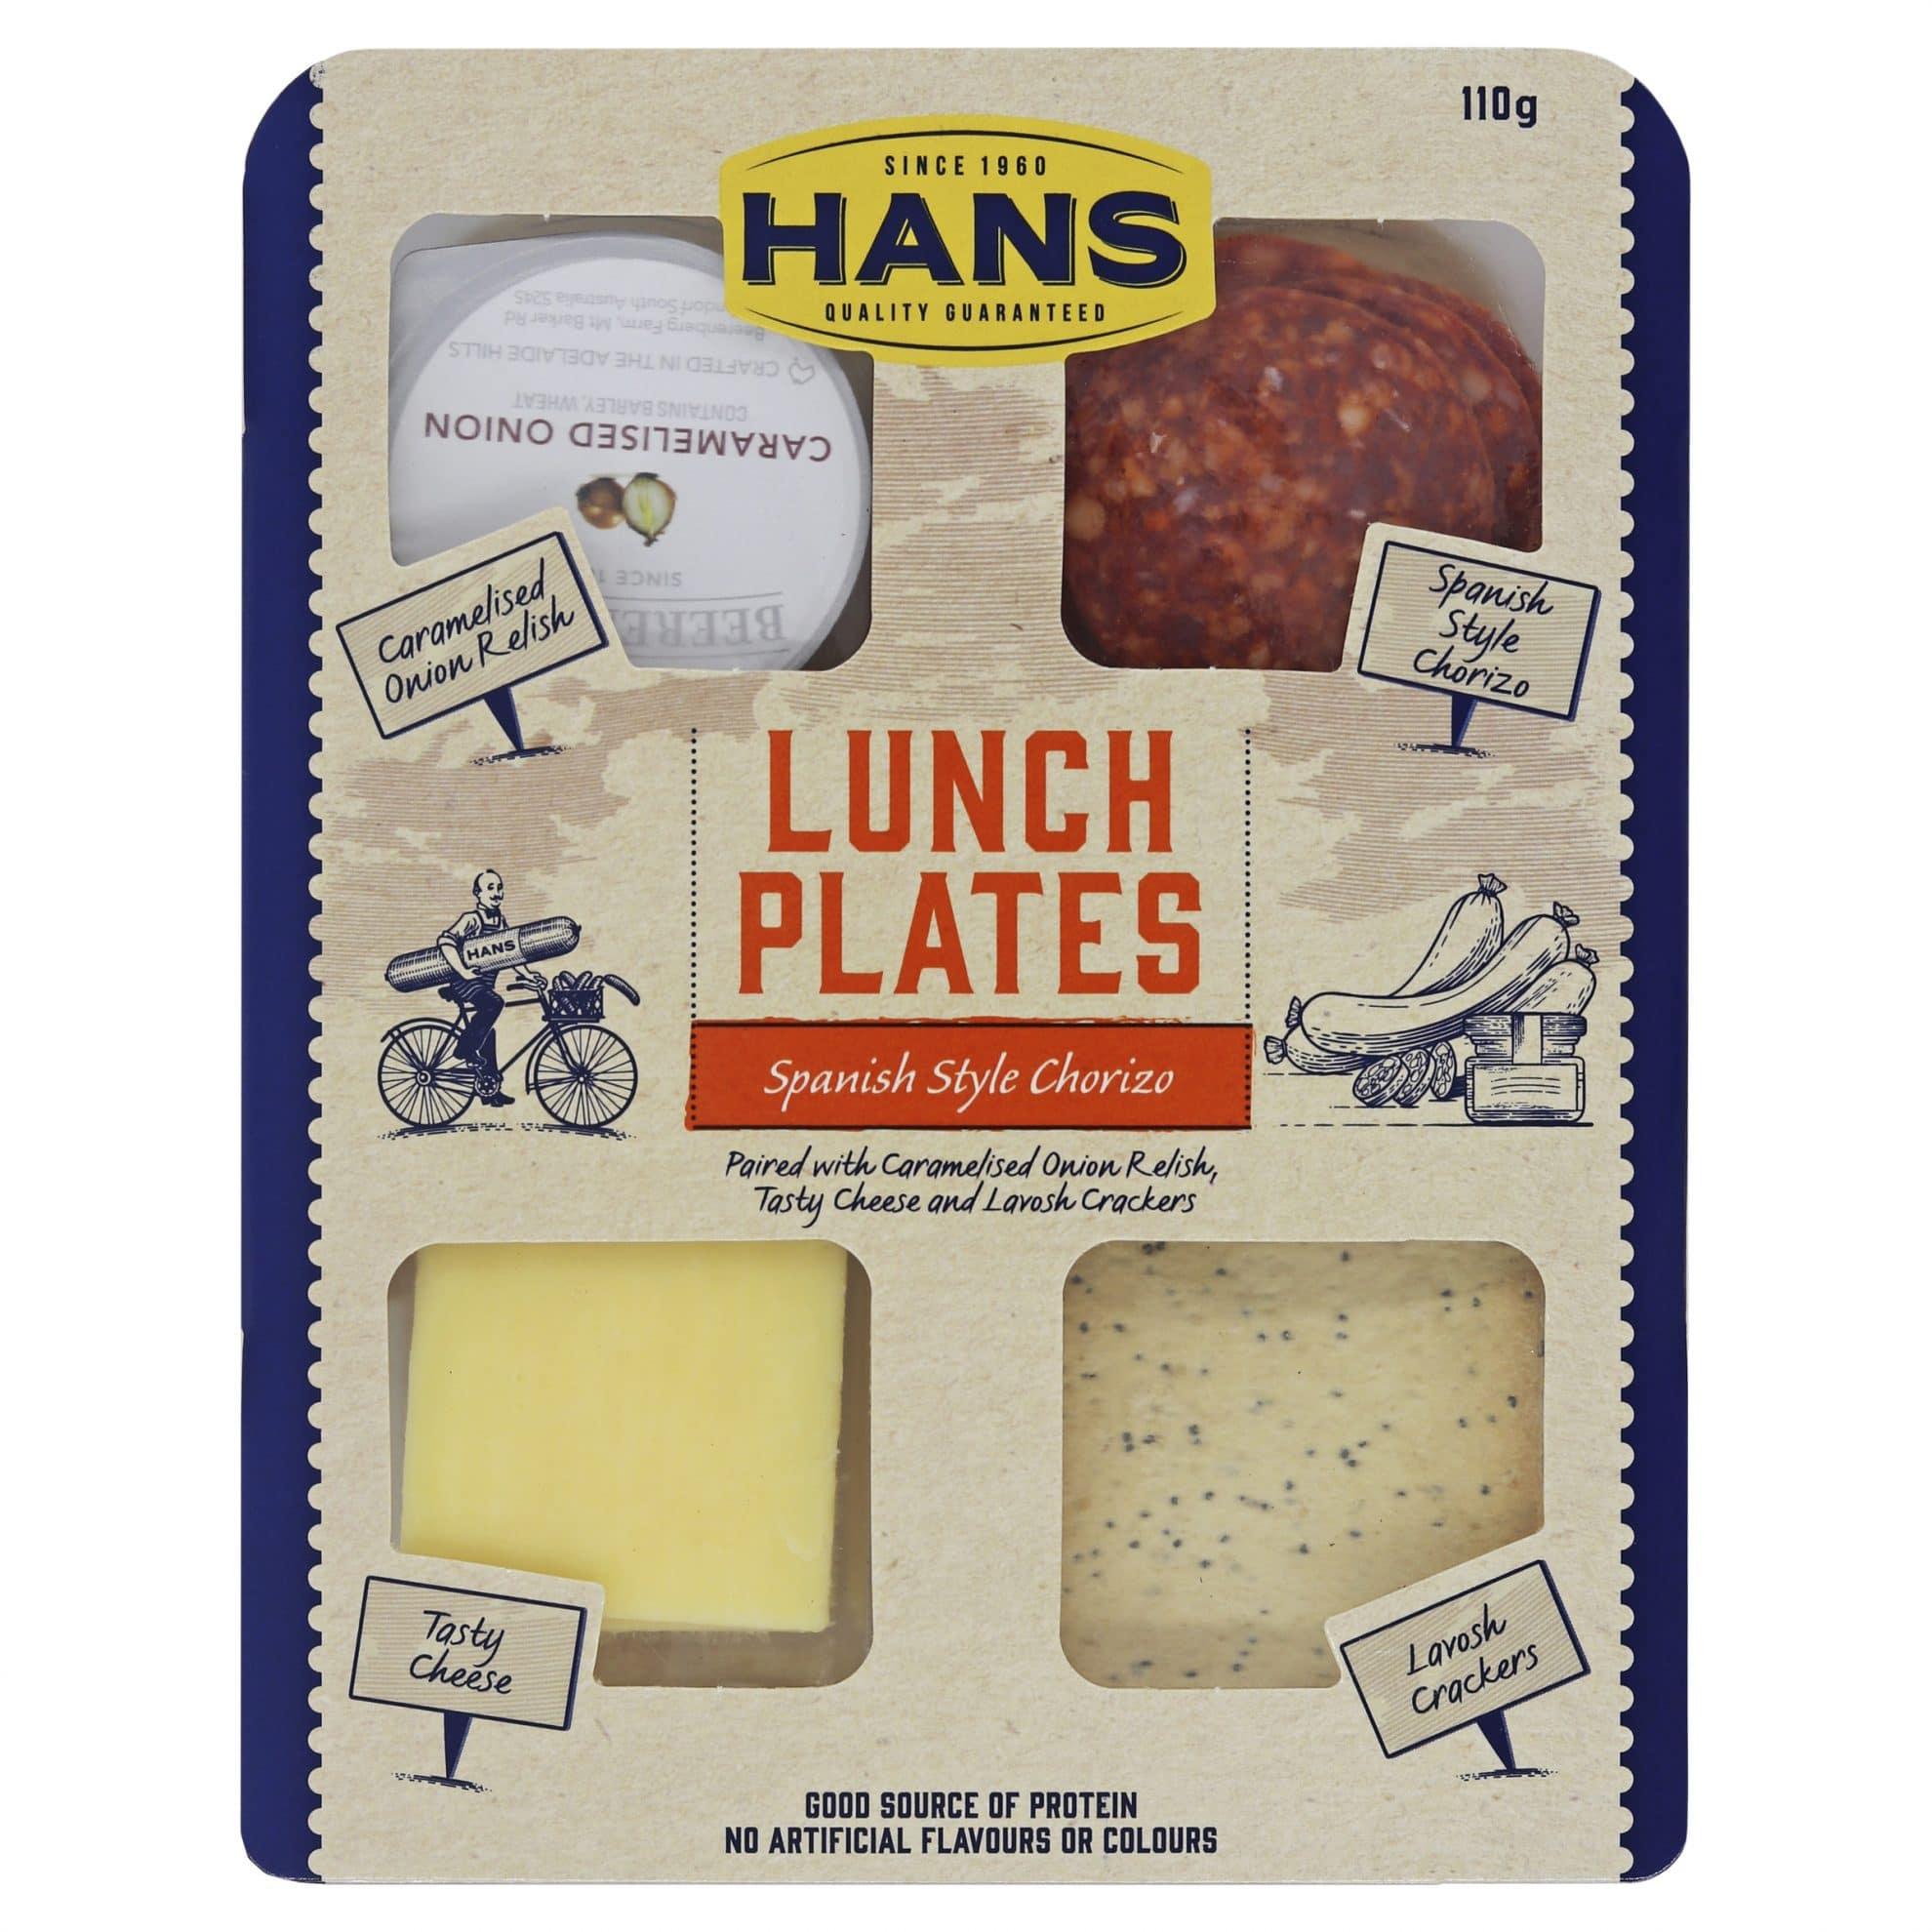 Hans Lunch Plate Spanish Style Chroizo 110g